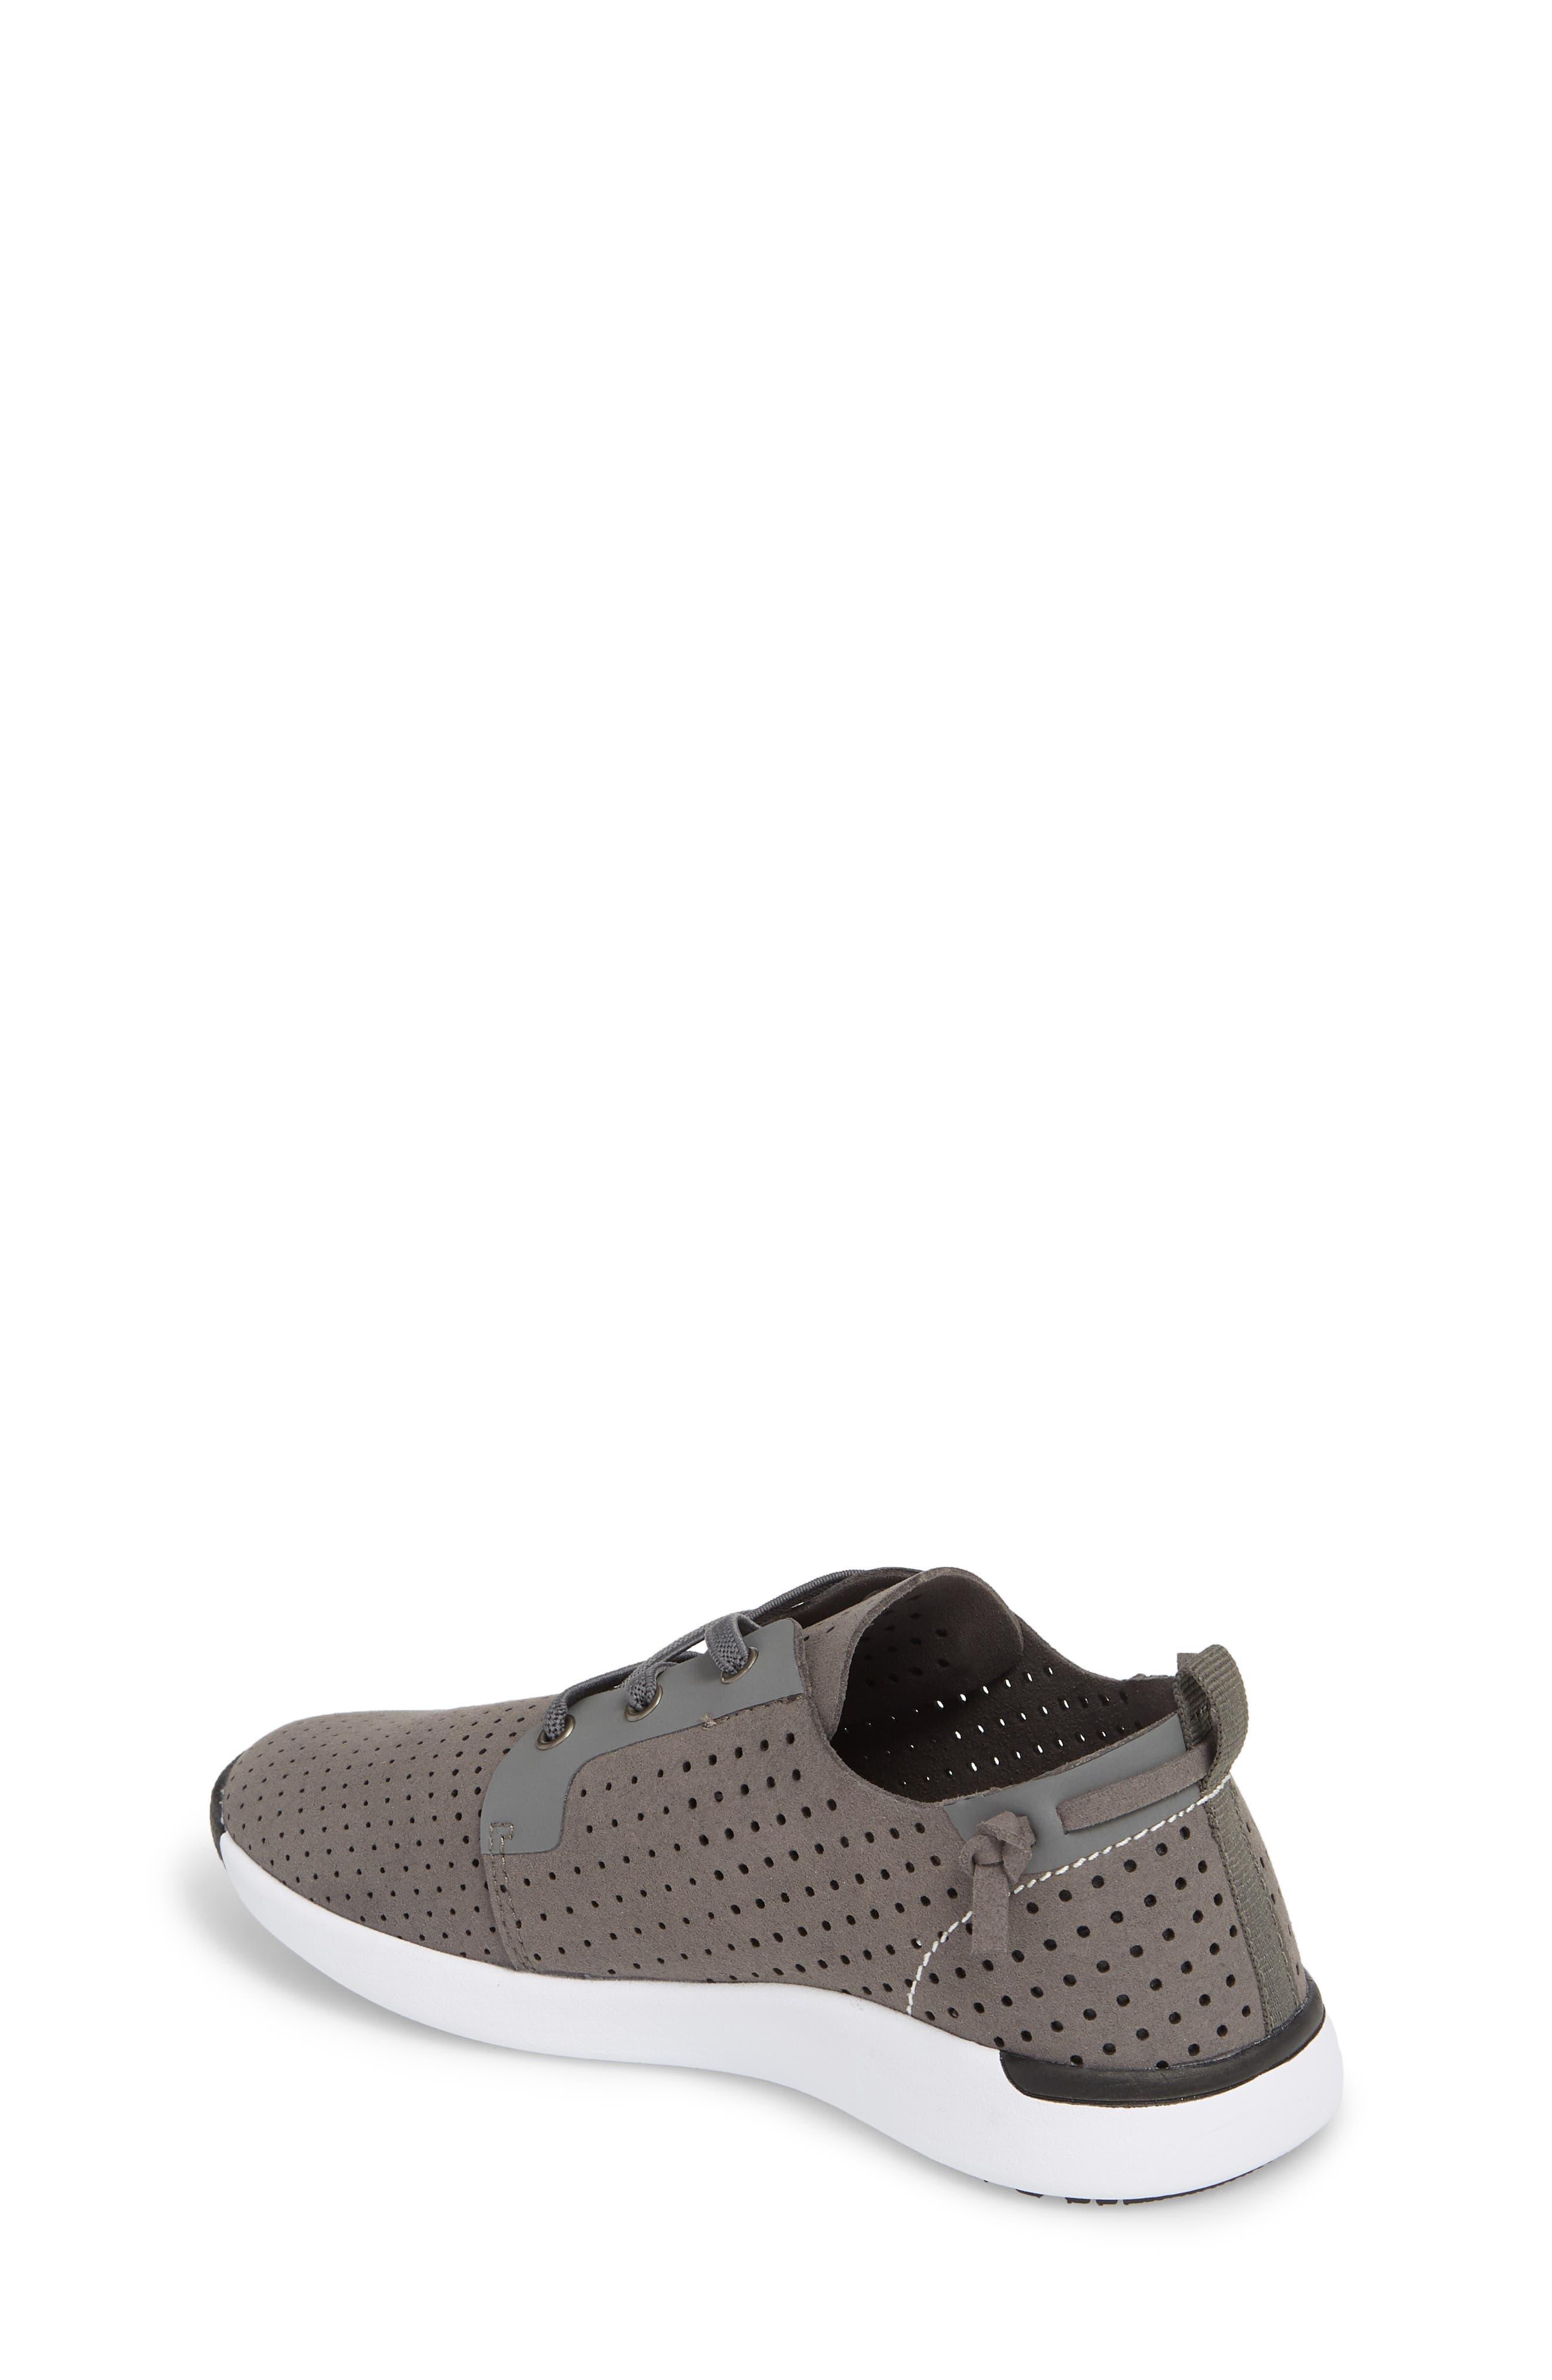 Brixxon Perforated Sneaker,                             Alternate thumbnail 2, color,                             Grey